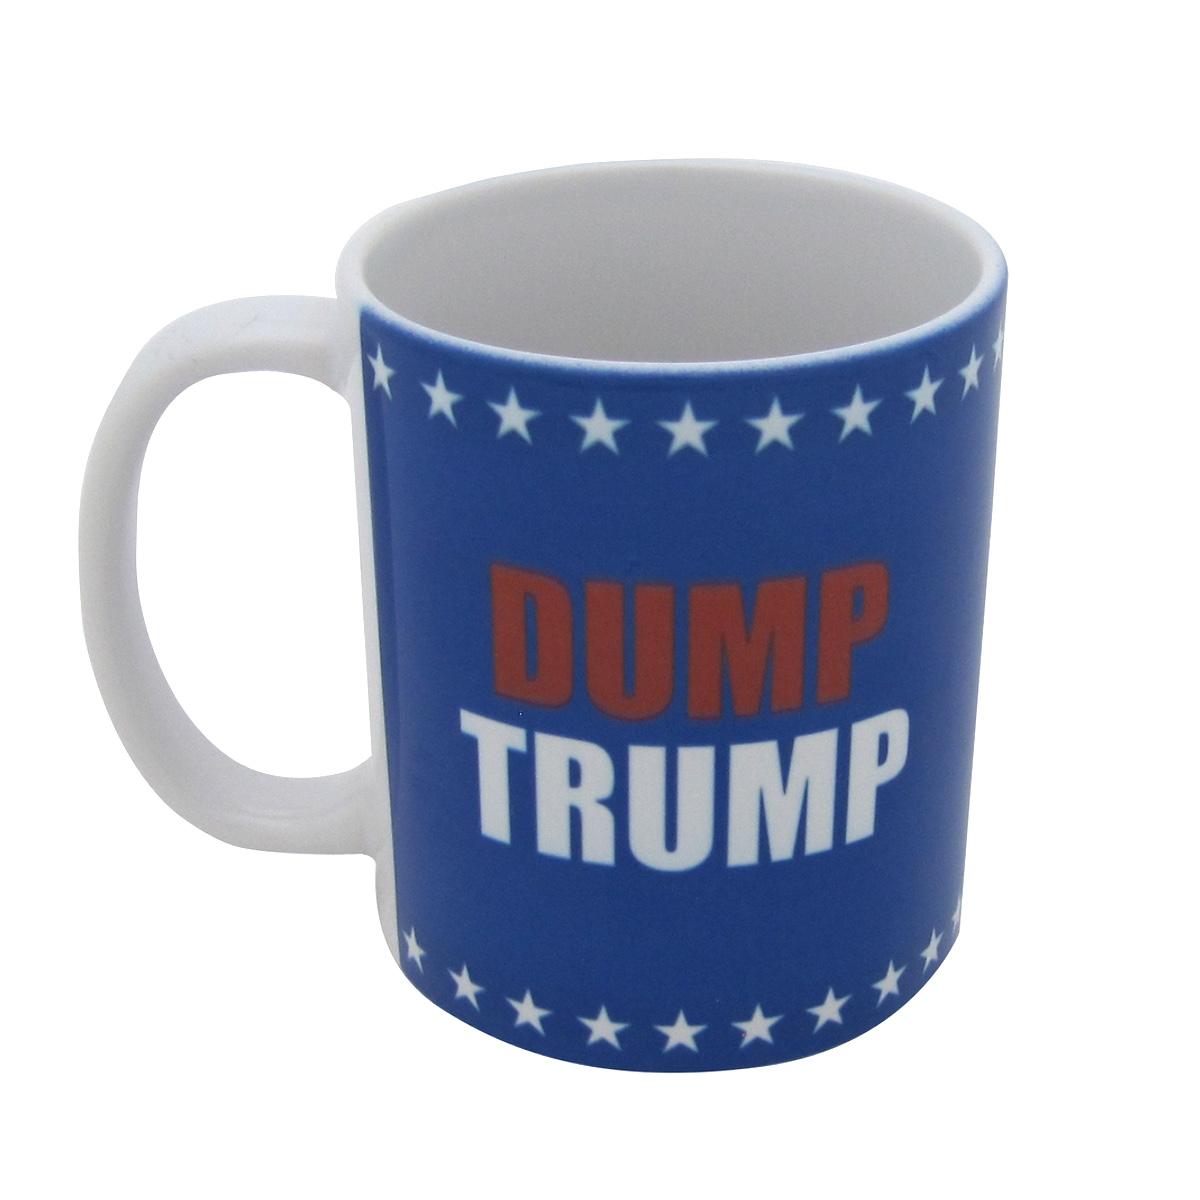 Donald Trump Magical Impeachment Color Changing 11oz Coffee Mug